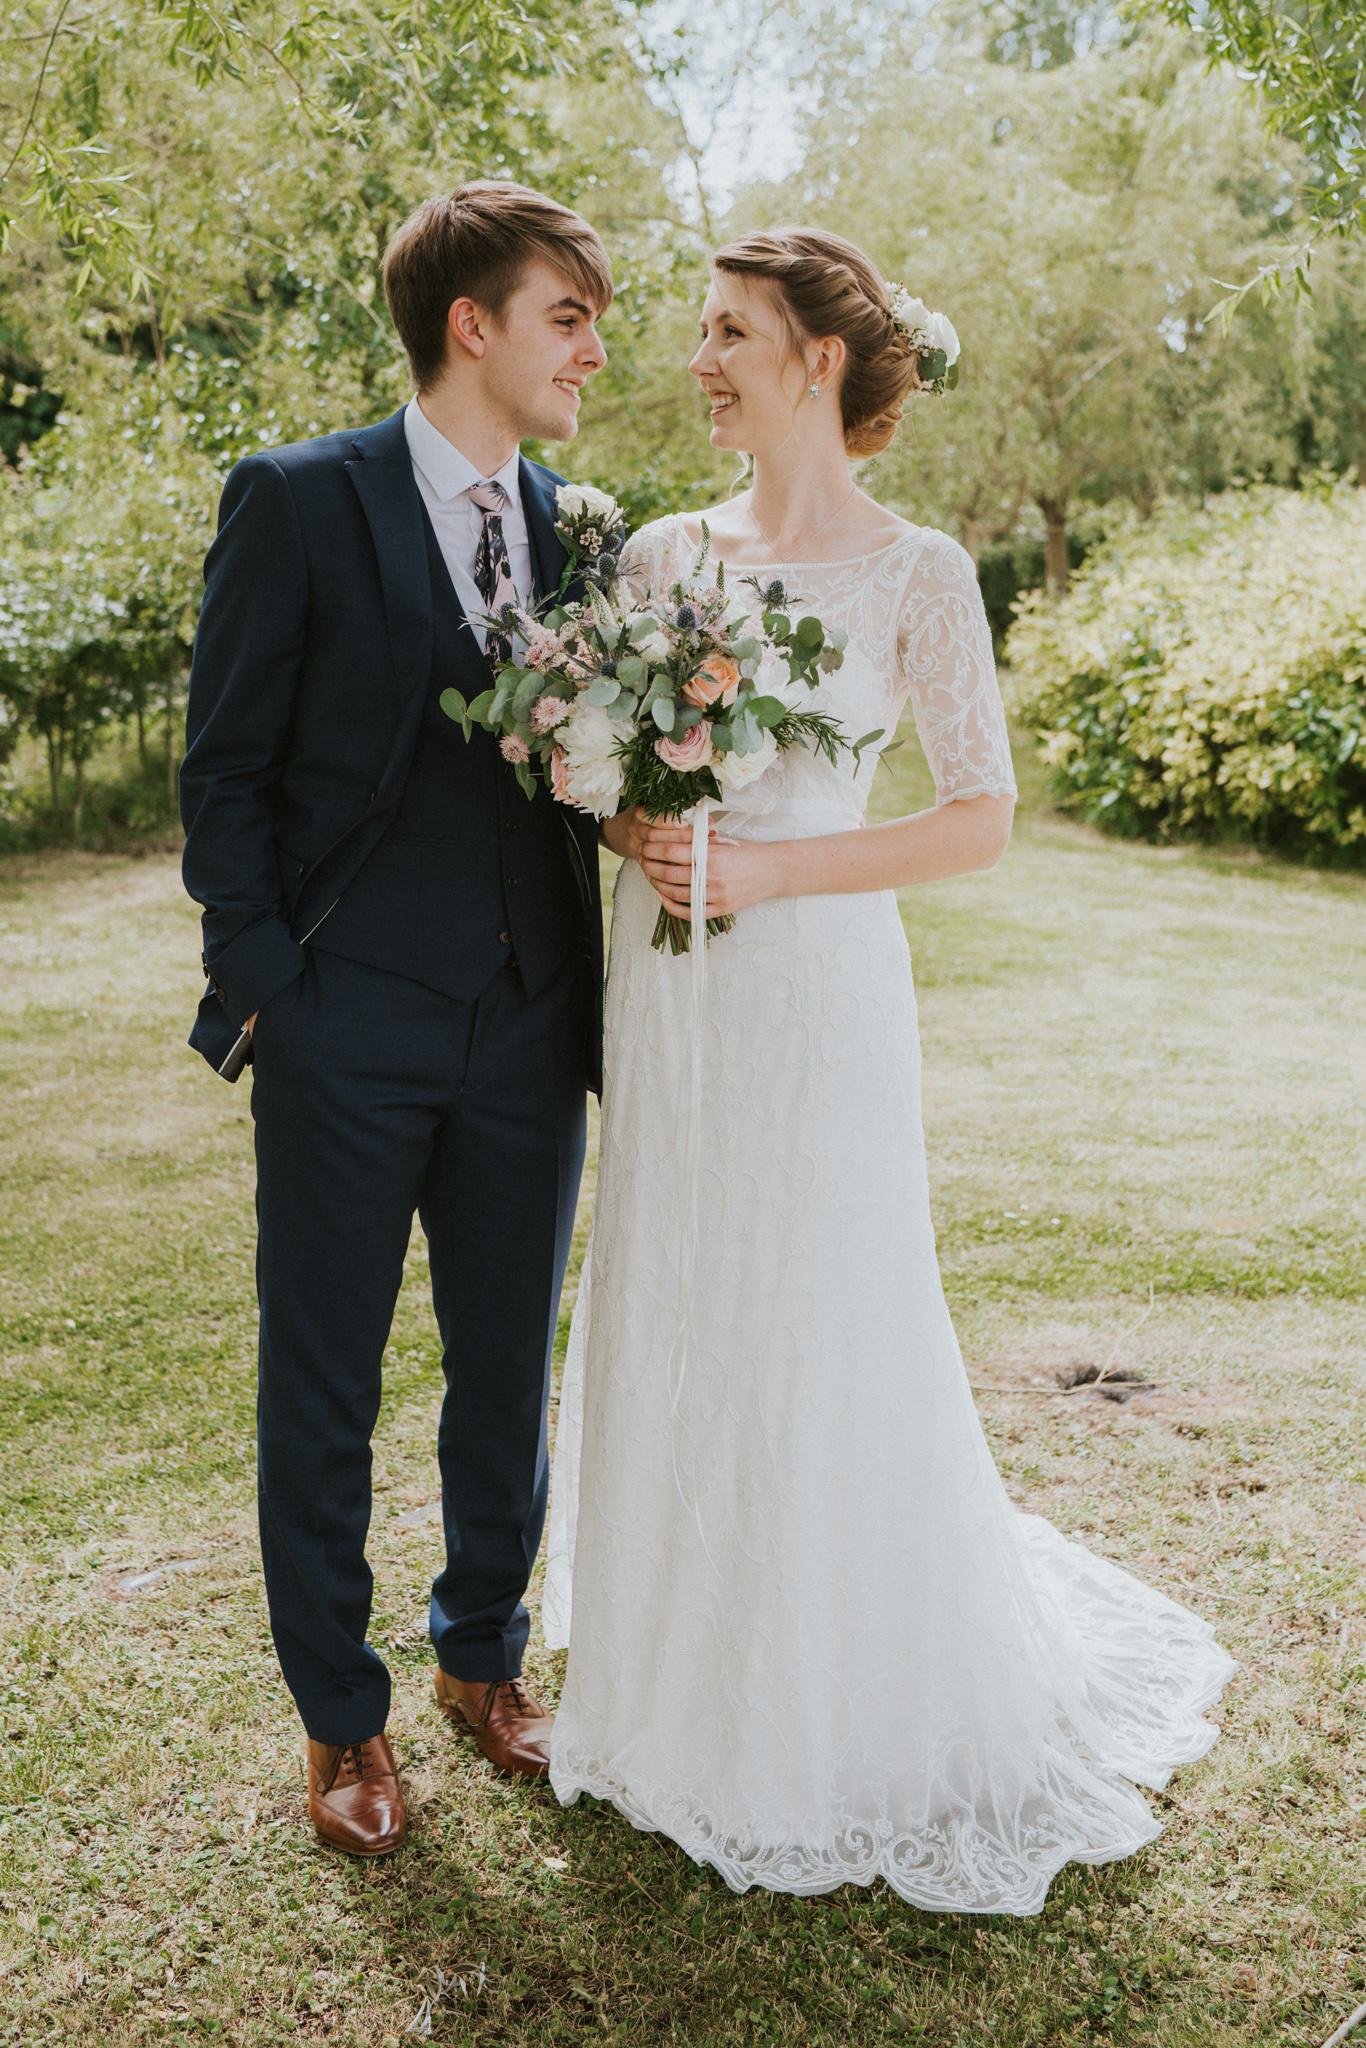 Jess-and-Tom-Norfolk-Alternative-Wedding-Essex-Wedding-Photographer-Grace-Elizabeth-13.jpg